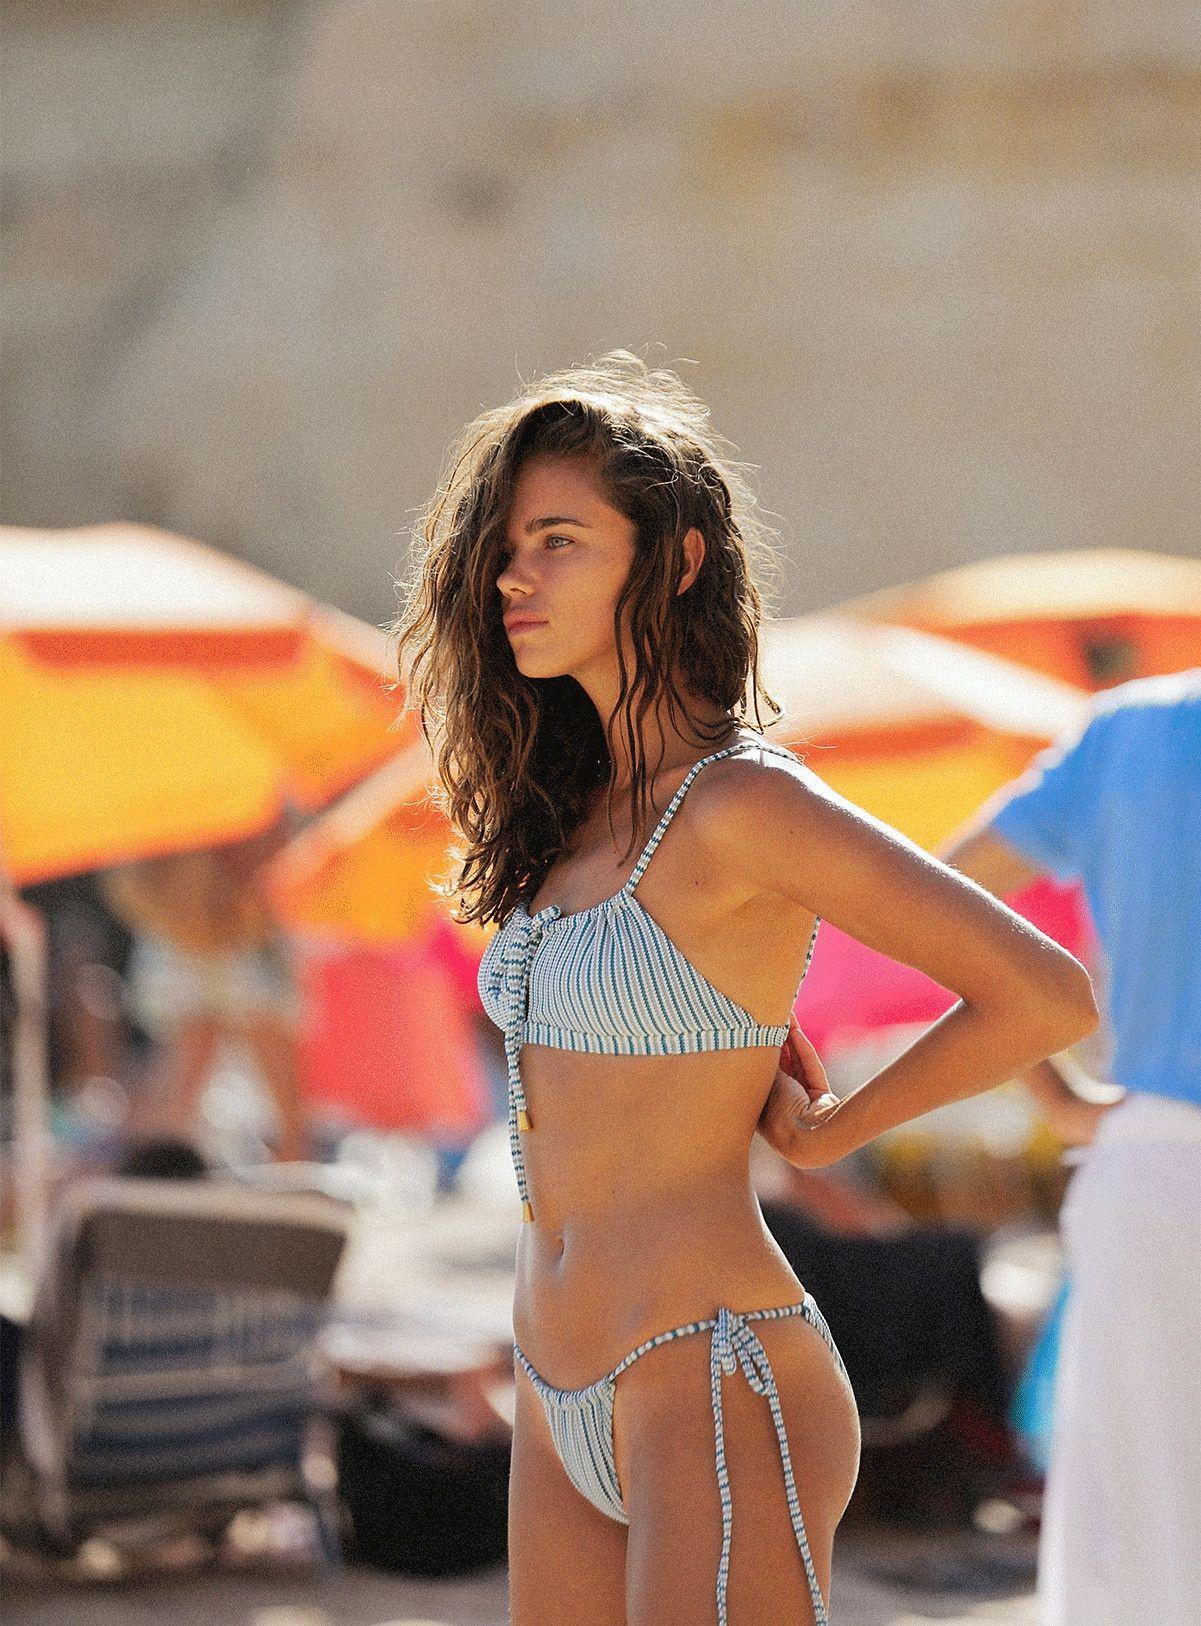 Bikini Jena Goldsack naked (75 photo), Tits, Hot, Selfie, butt 2020